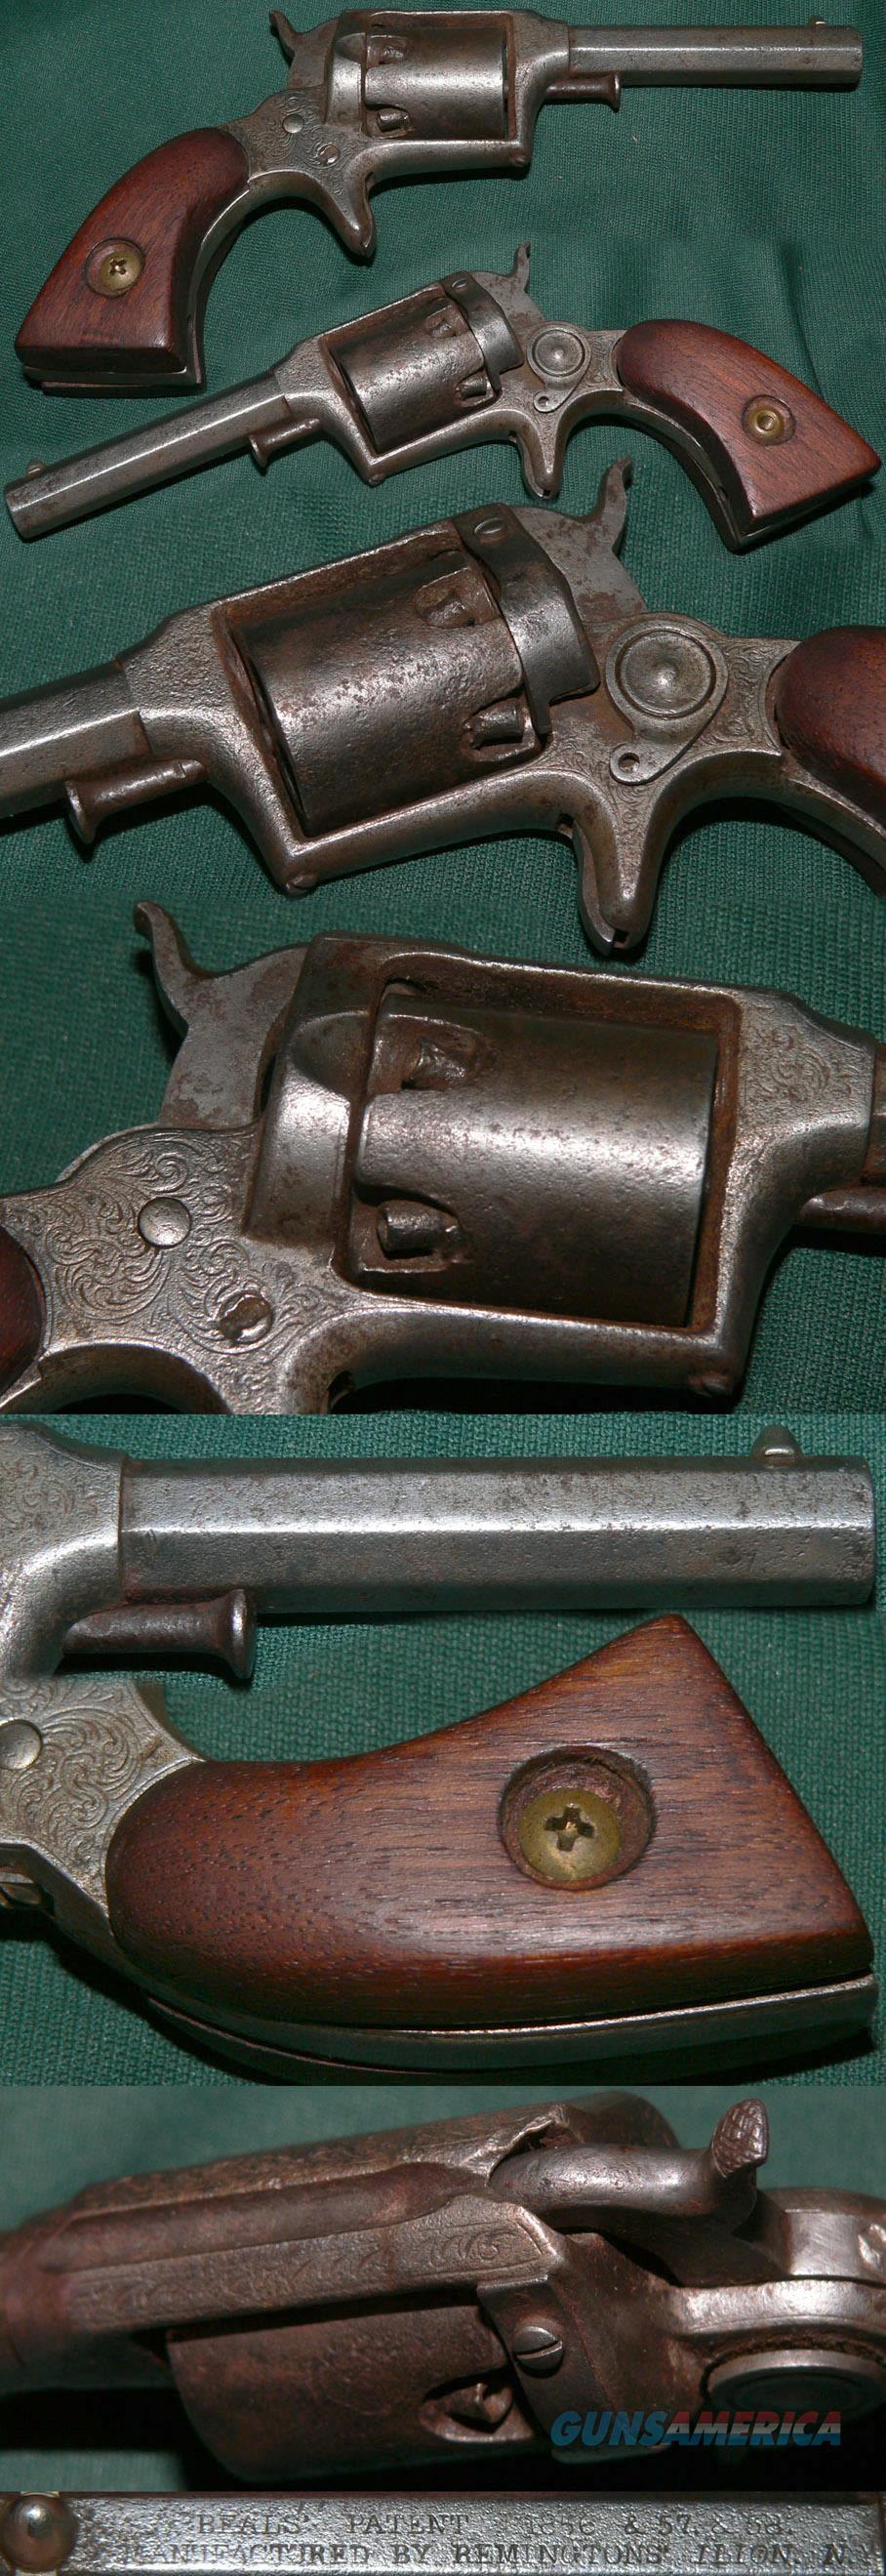 Remington-Beals 2nd Model percussion pocket revolver  Guns > Pistols > Remington Pistols - Pre-1899